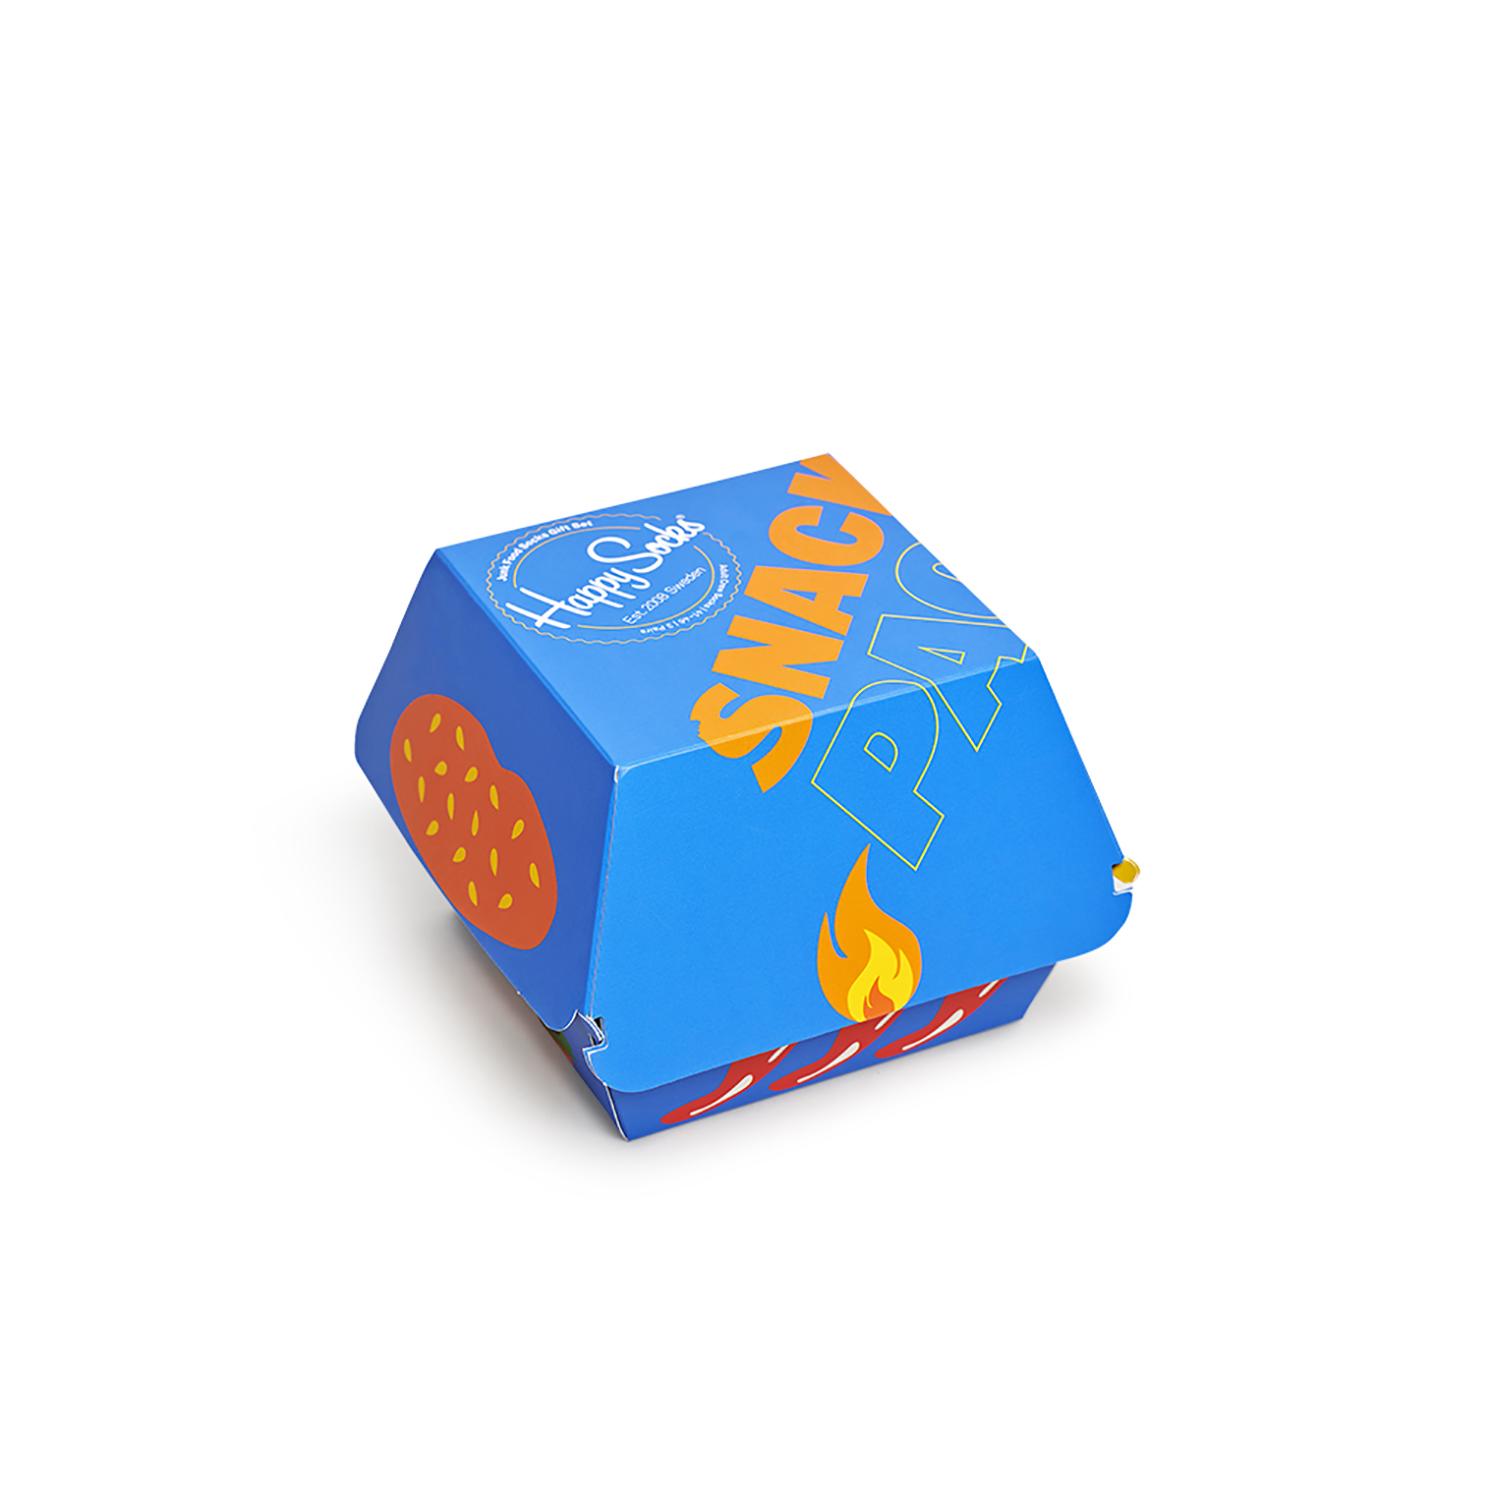 Happy Socks – Set of 3 Pairs of Junk Food Socks in Presentation Gift Box